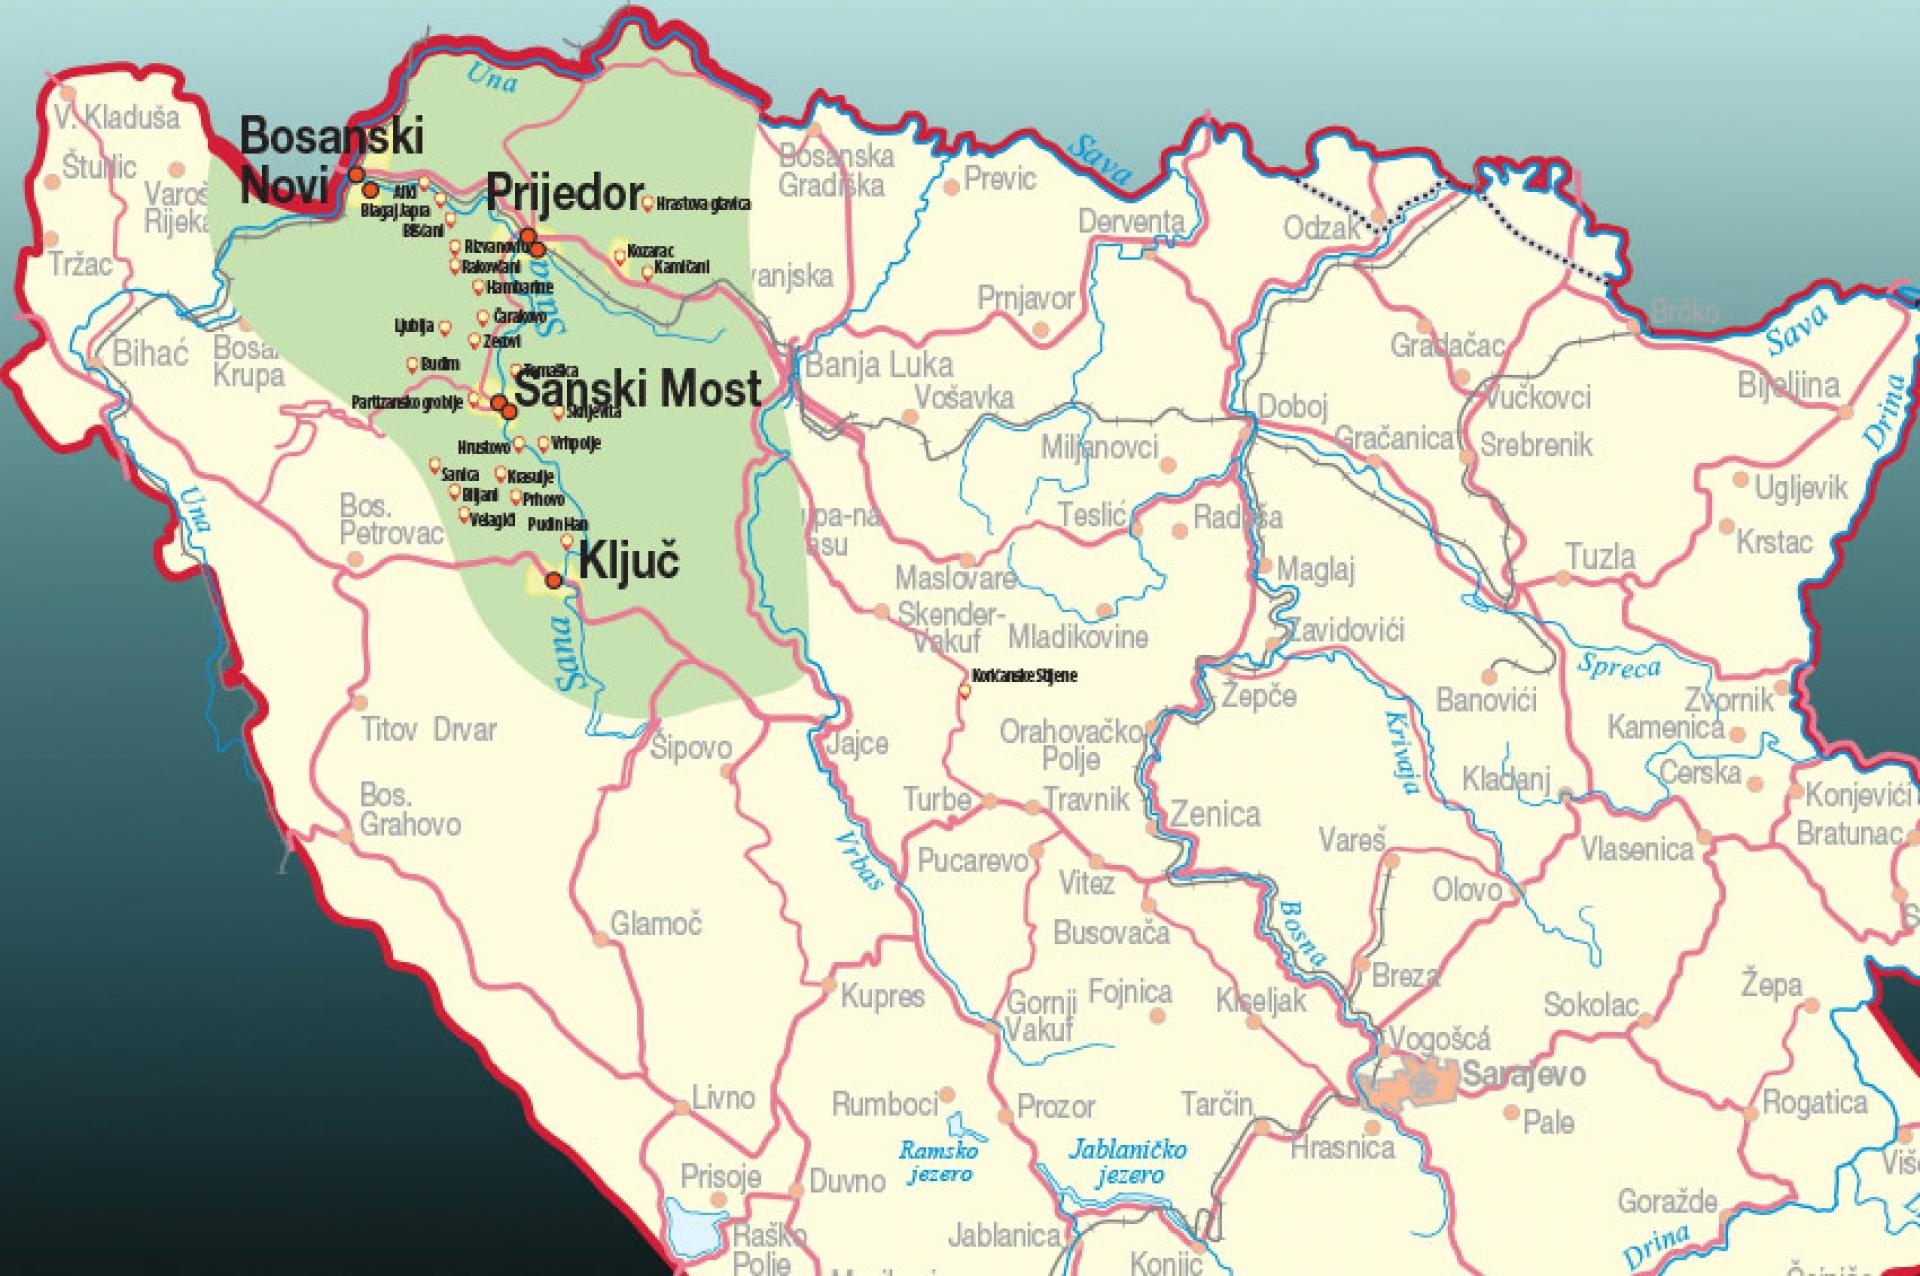 Zločini - Dolina Sane: Ključ, Sanski Most, Prijedor i Bosanski Novi